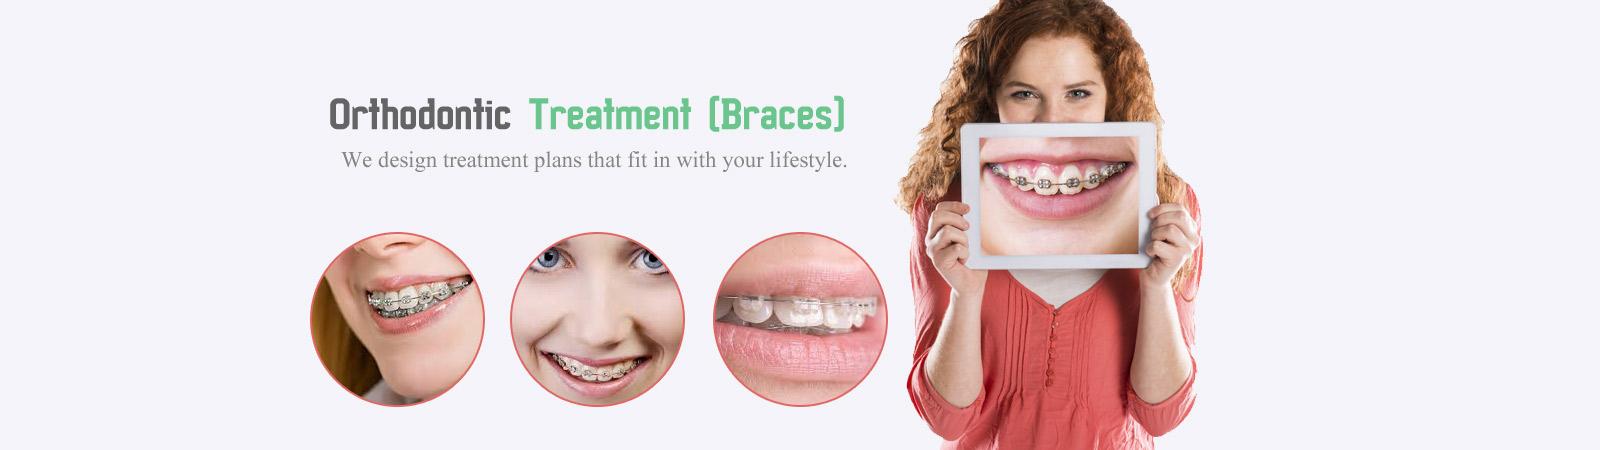 orthodontics in miranda,dental implants,clear braces,cosmetic dentist,dentist open on sunday